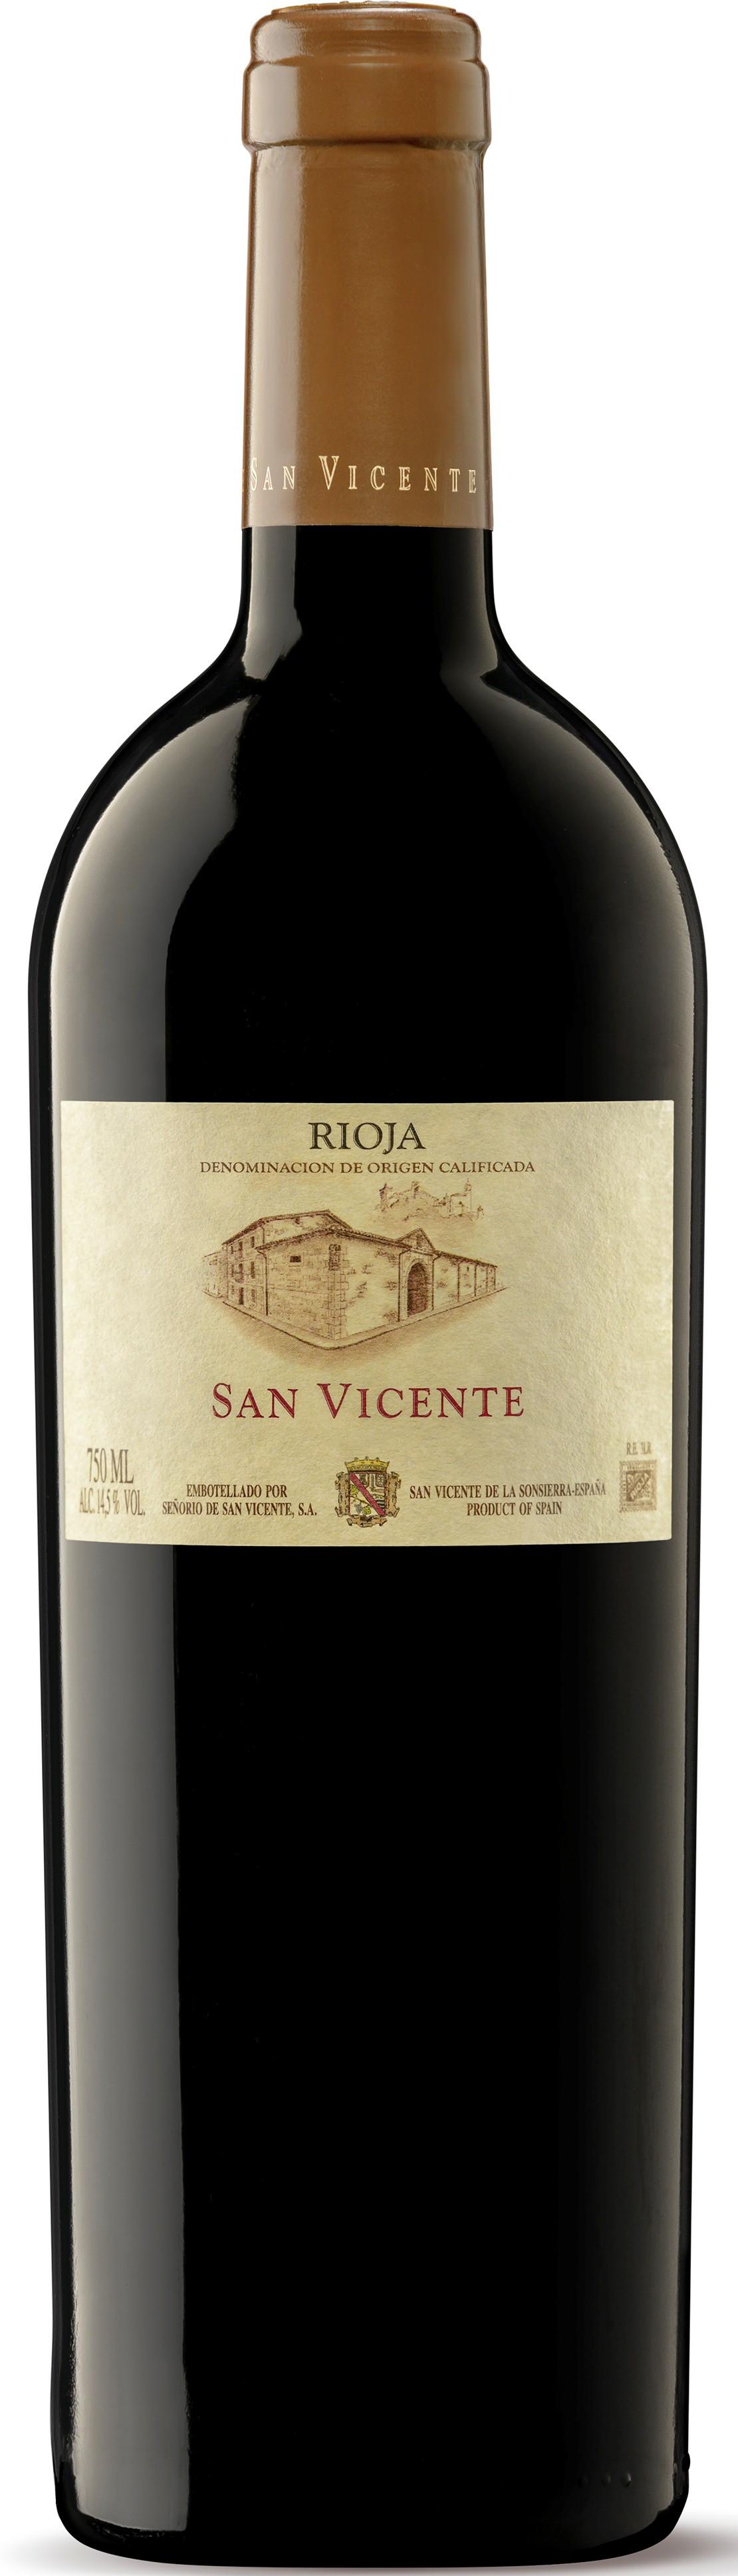 San Vicente 2016 - D.O.Ca Rioja - Marcos Eguren